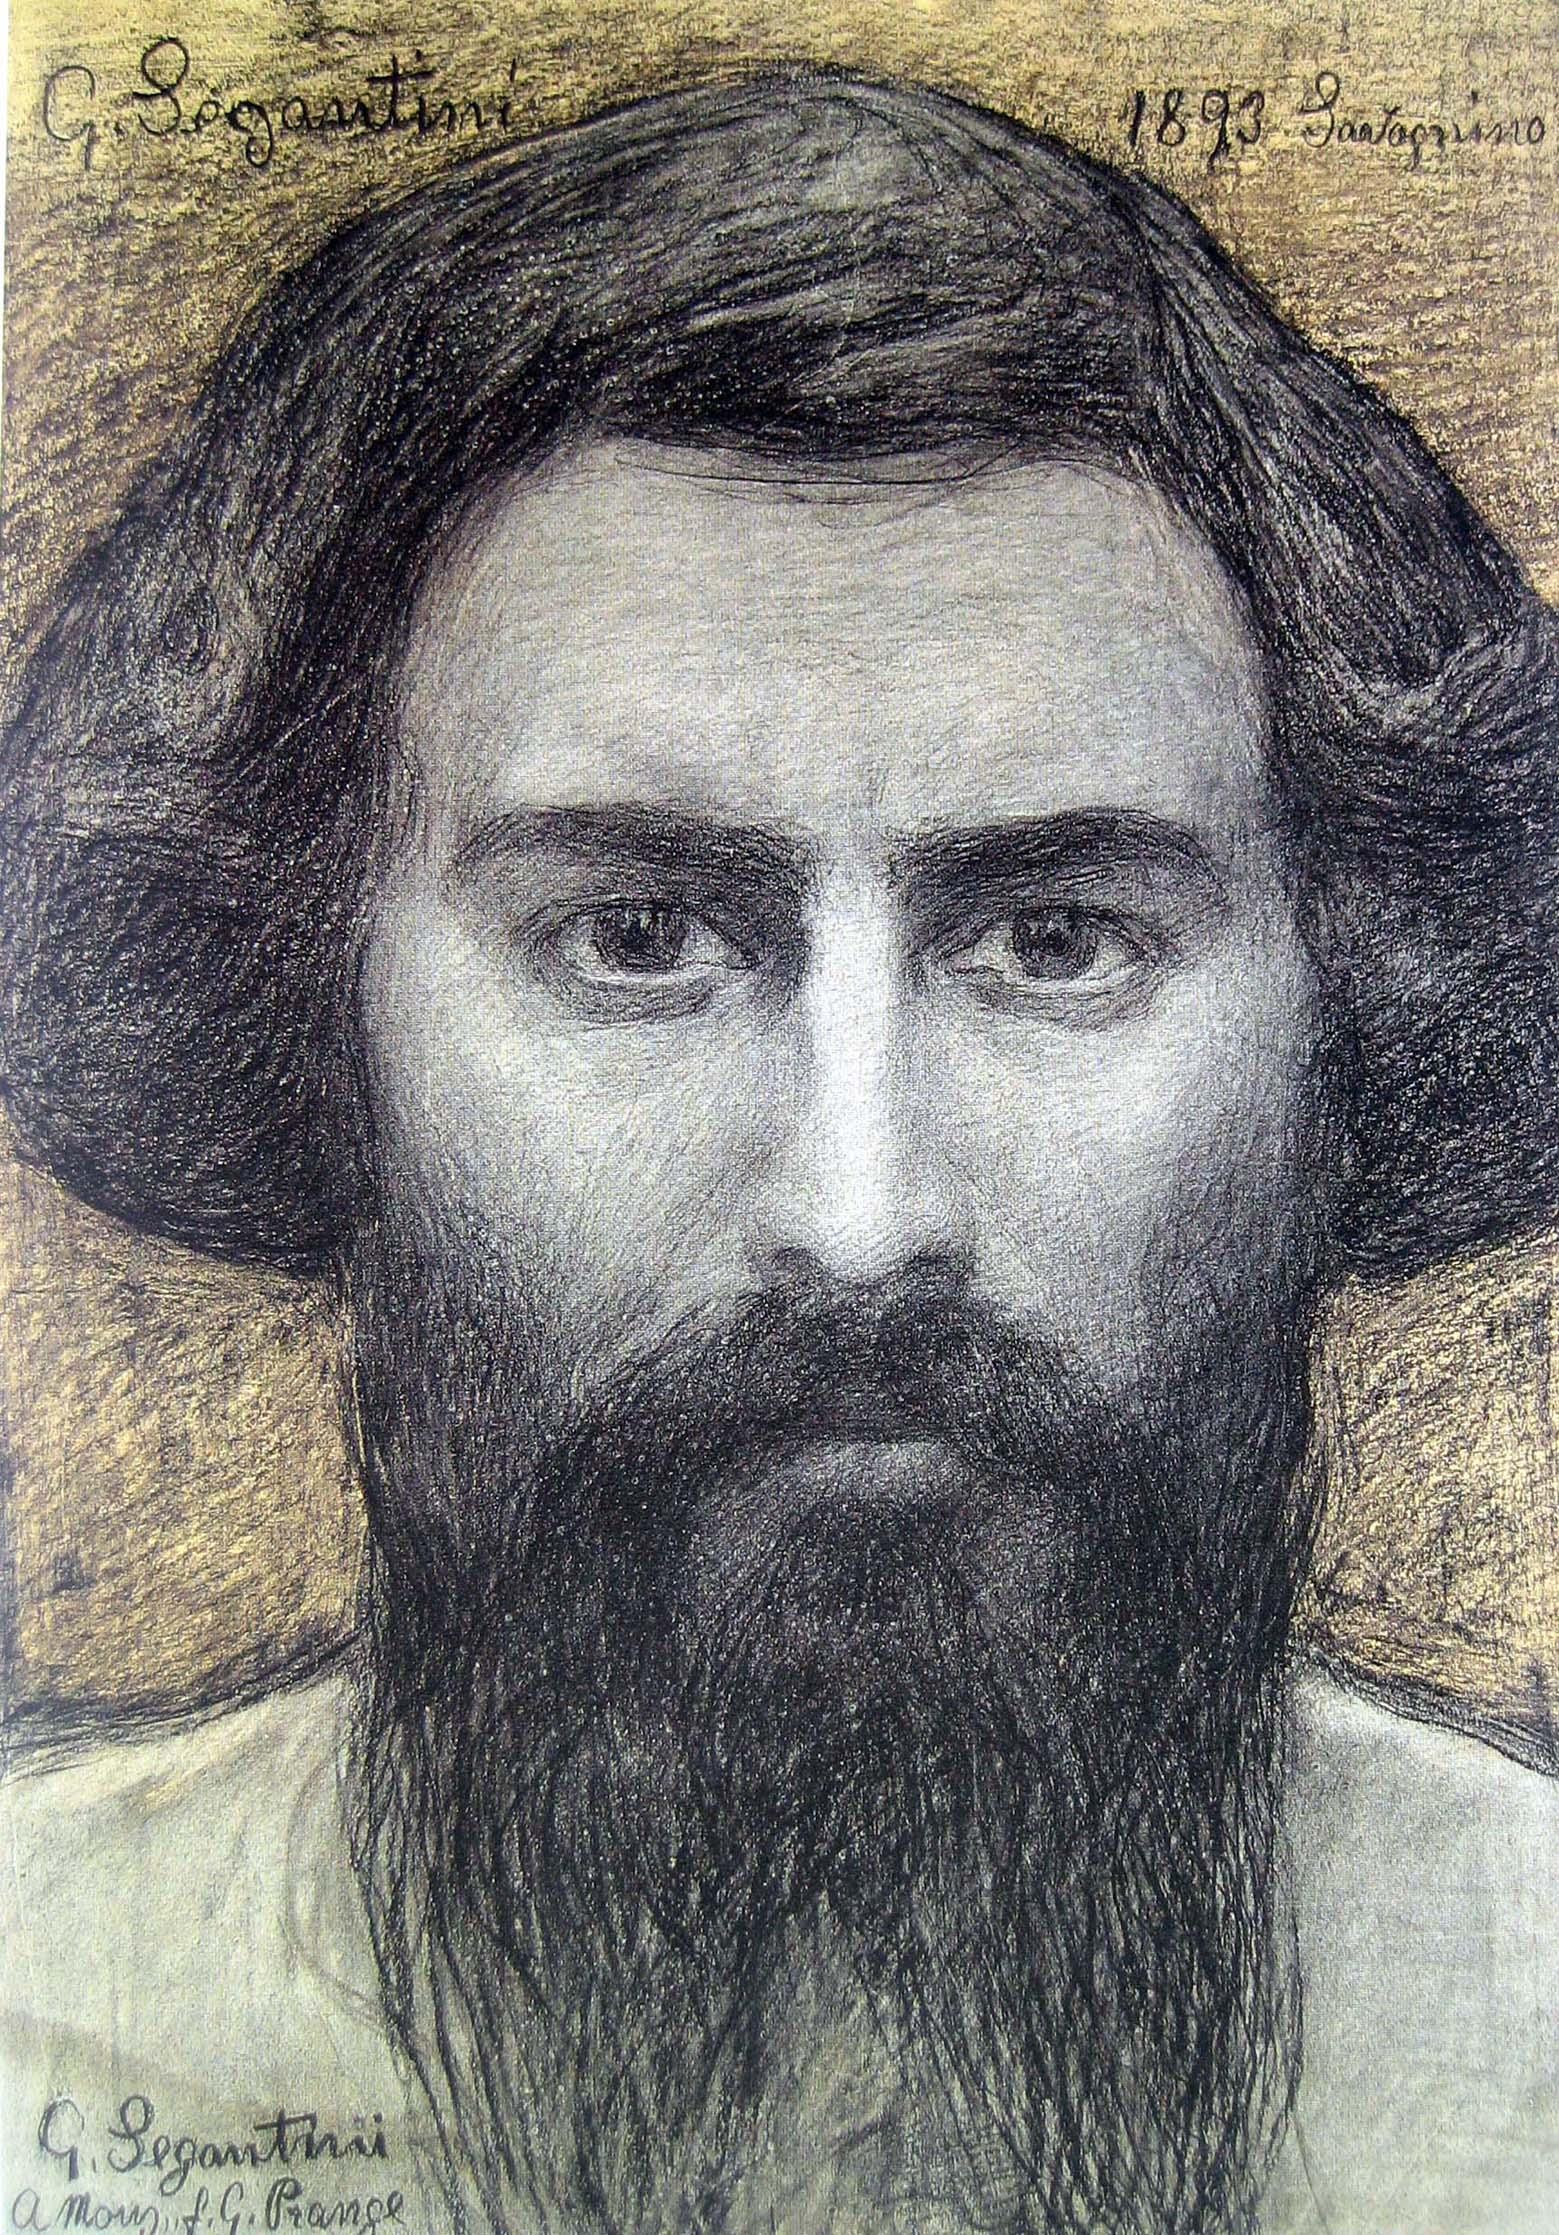 Giovanni Segantini - Wikipedia